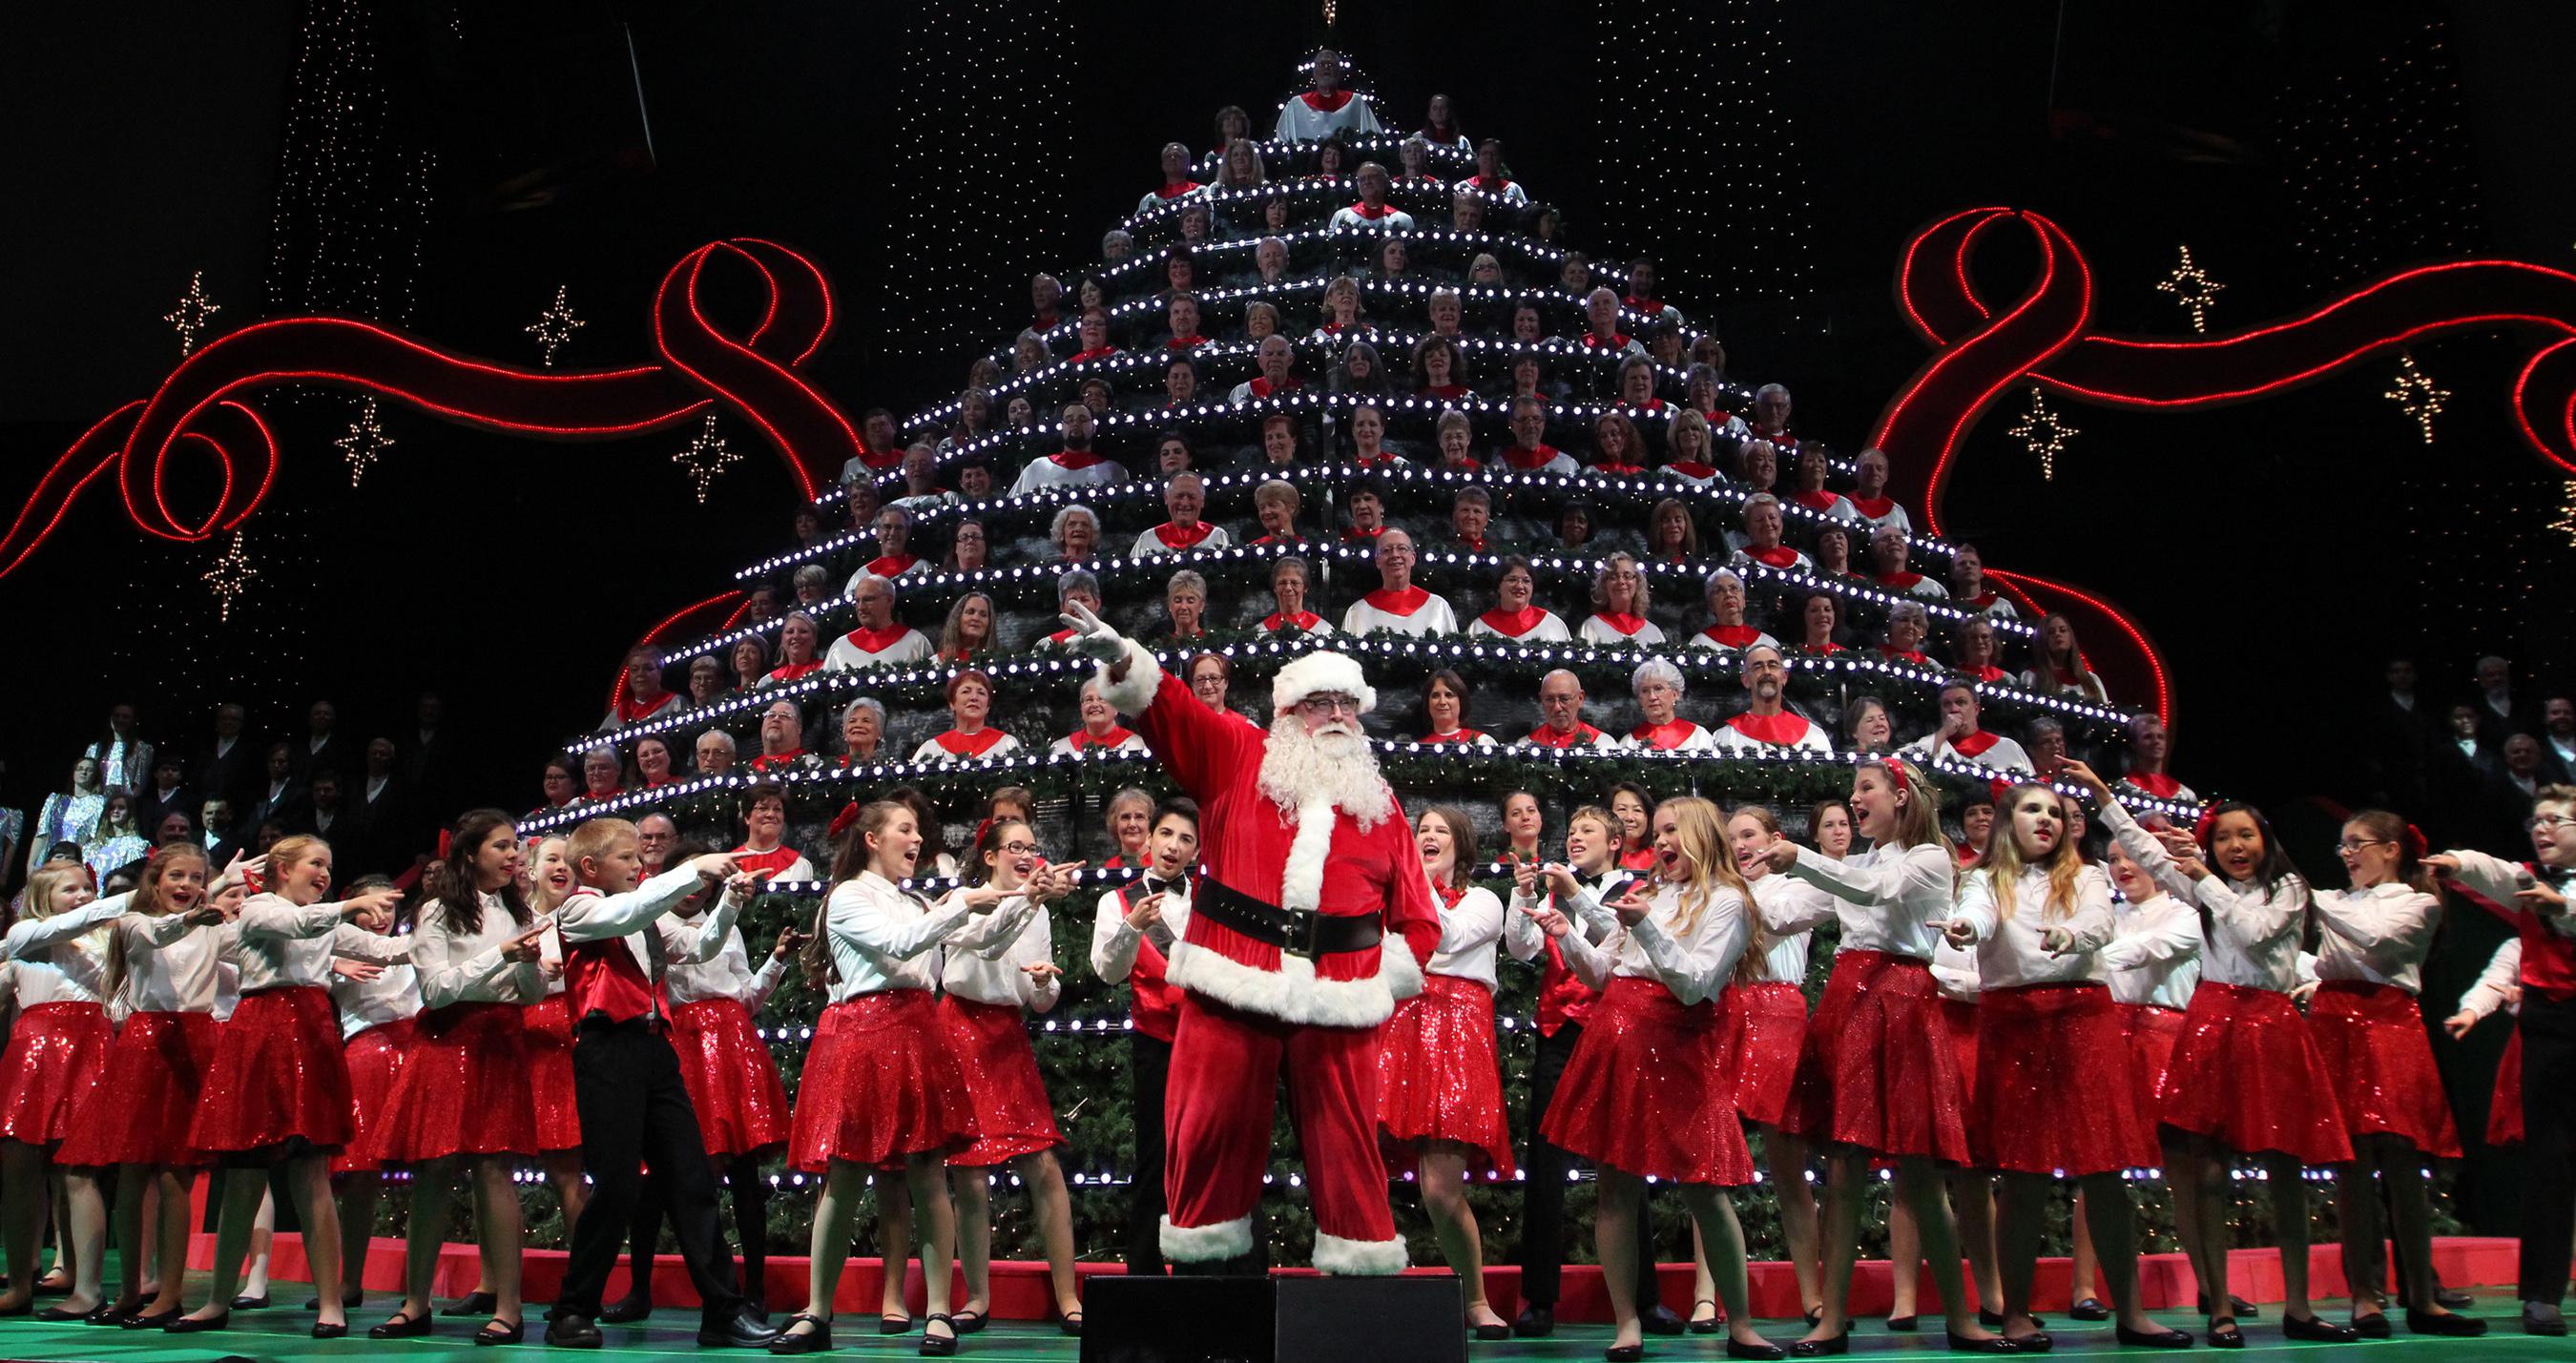 Reviews Of 2020 Portland Singing Christmas Tree Portland's Singing Christmas Tree returns to the Keller stage Nov